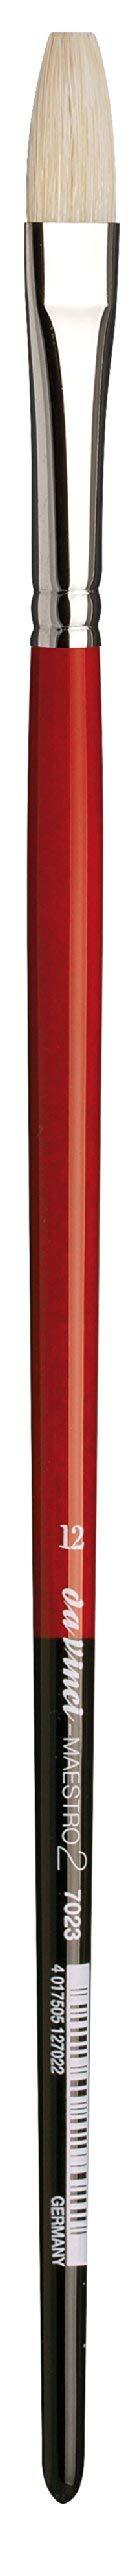 da Vinci Hog Bristle Series 7023 Maestro 2 Artist Paint Brush, Flat with European Sizing, Size 12